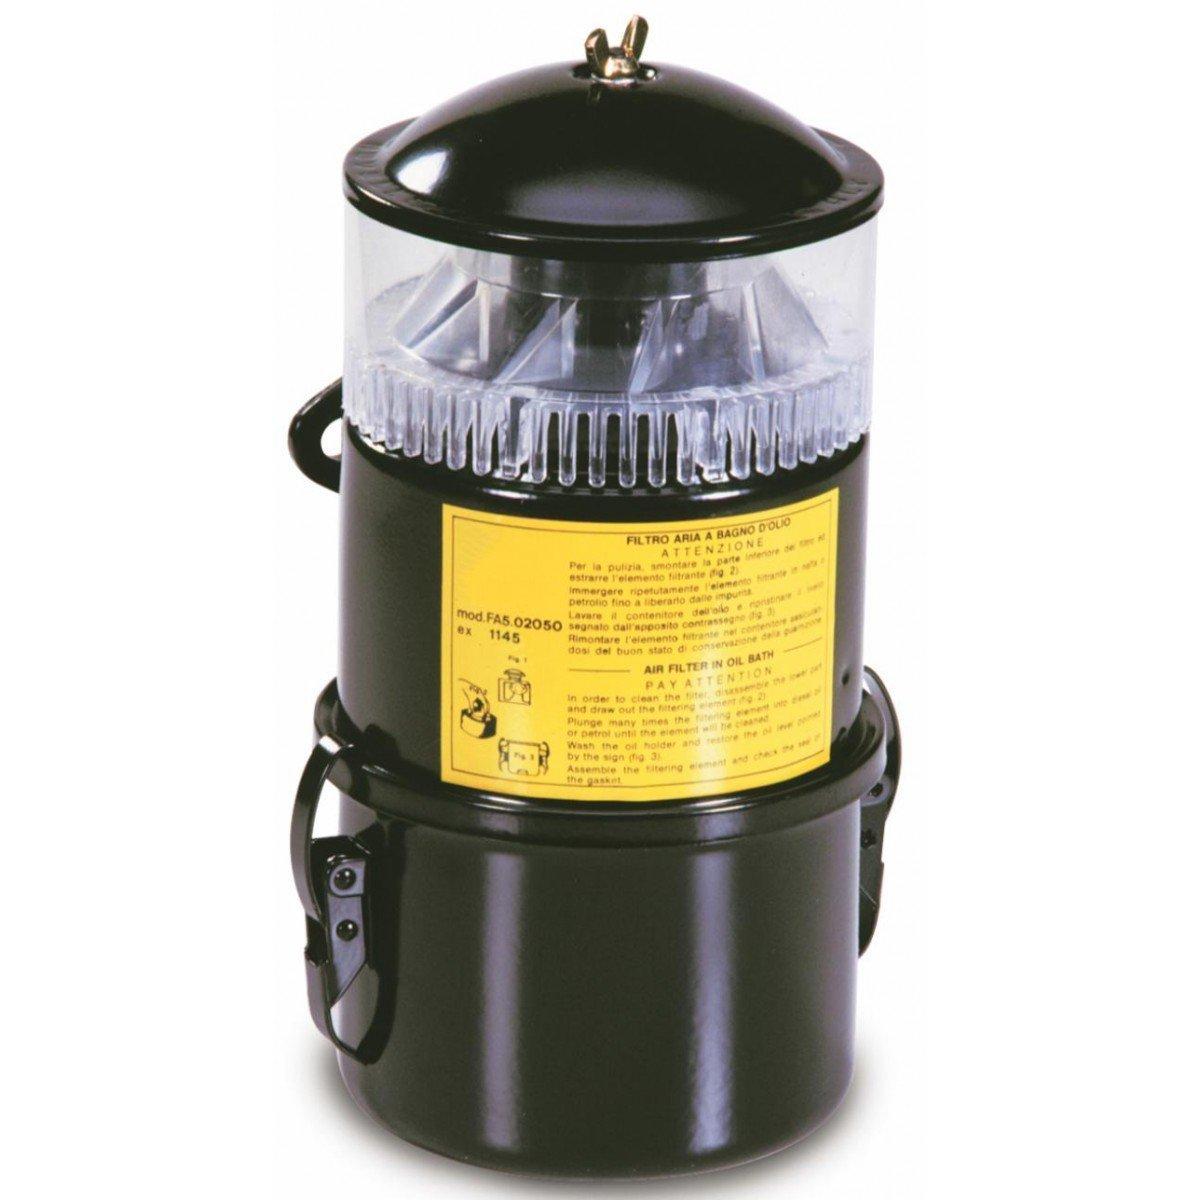 Filtro Aire a ba/ño de aceite con prefiltro a Ciclone adaptable a Ruggerini 388.29/de ama